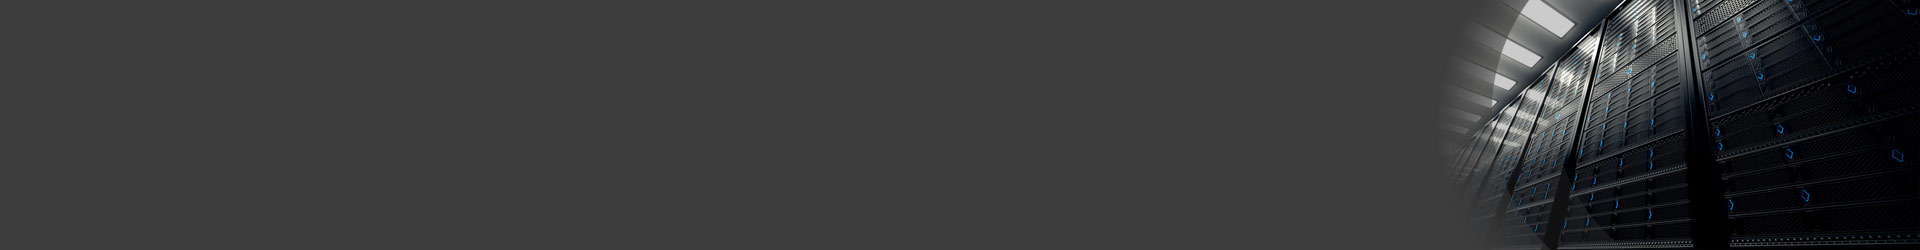 netzwerk-slider-small